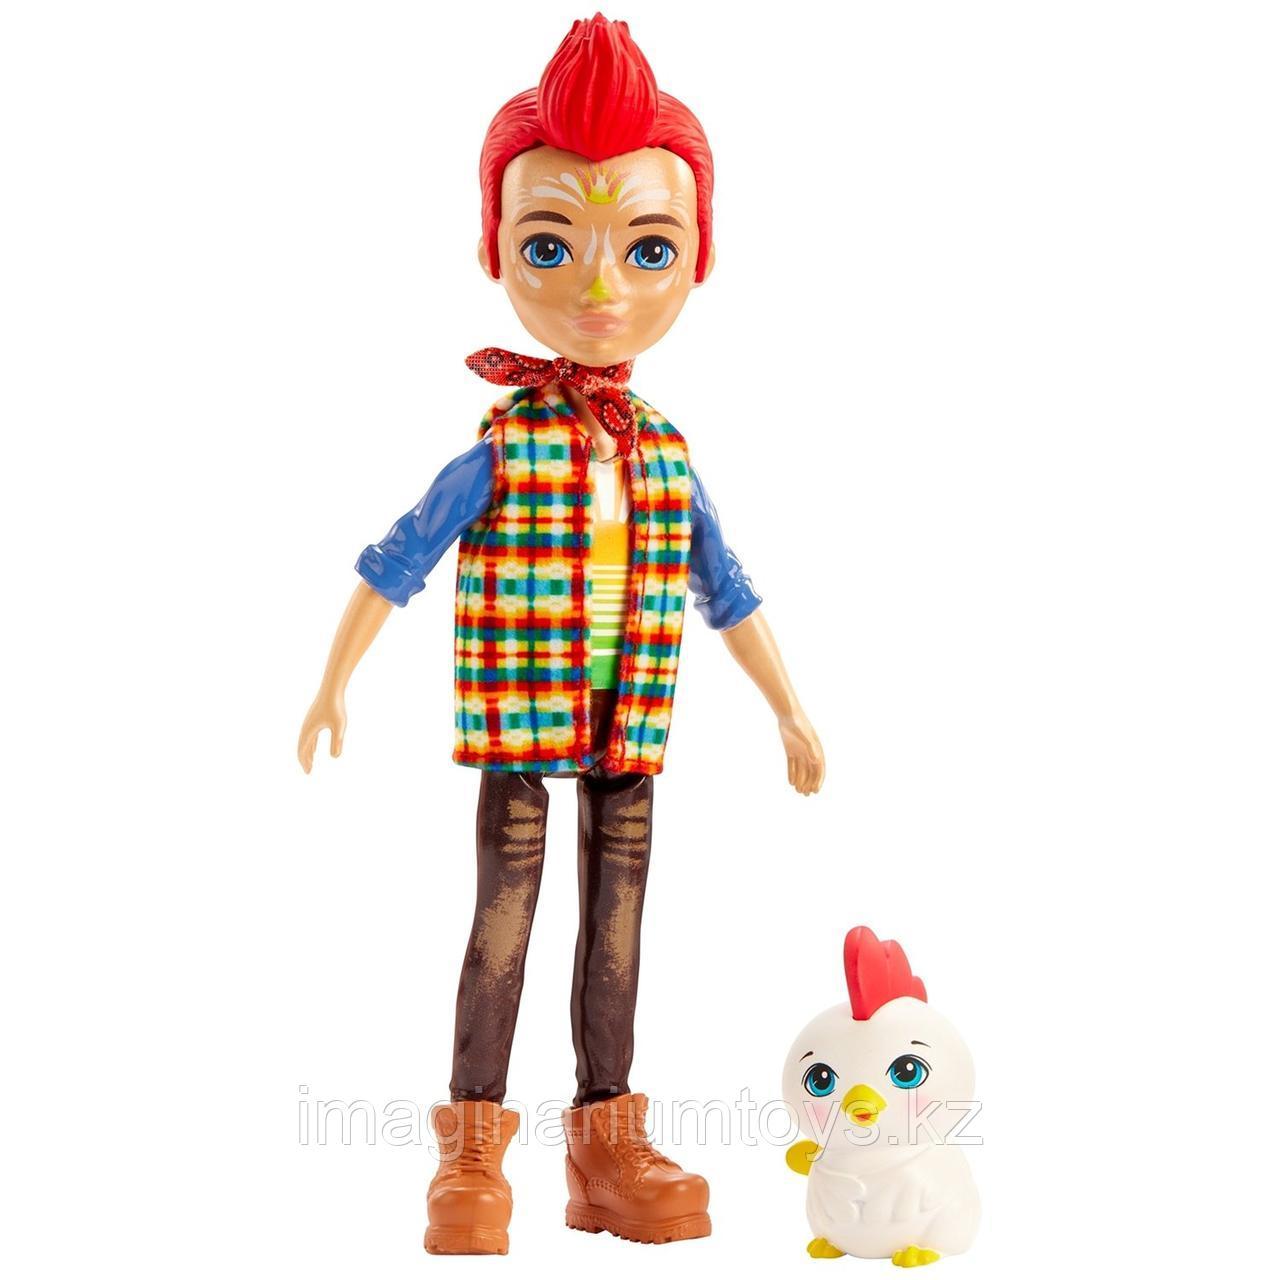 Кукла Enchantimals мальчик петушок Ривод Рустер и Клак